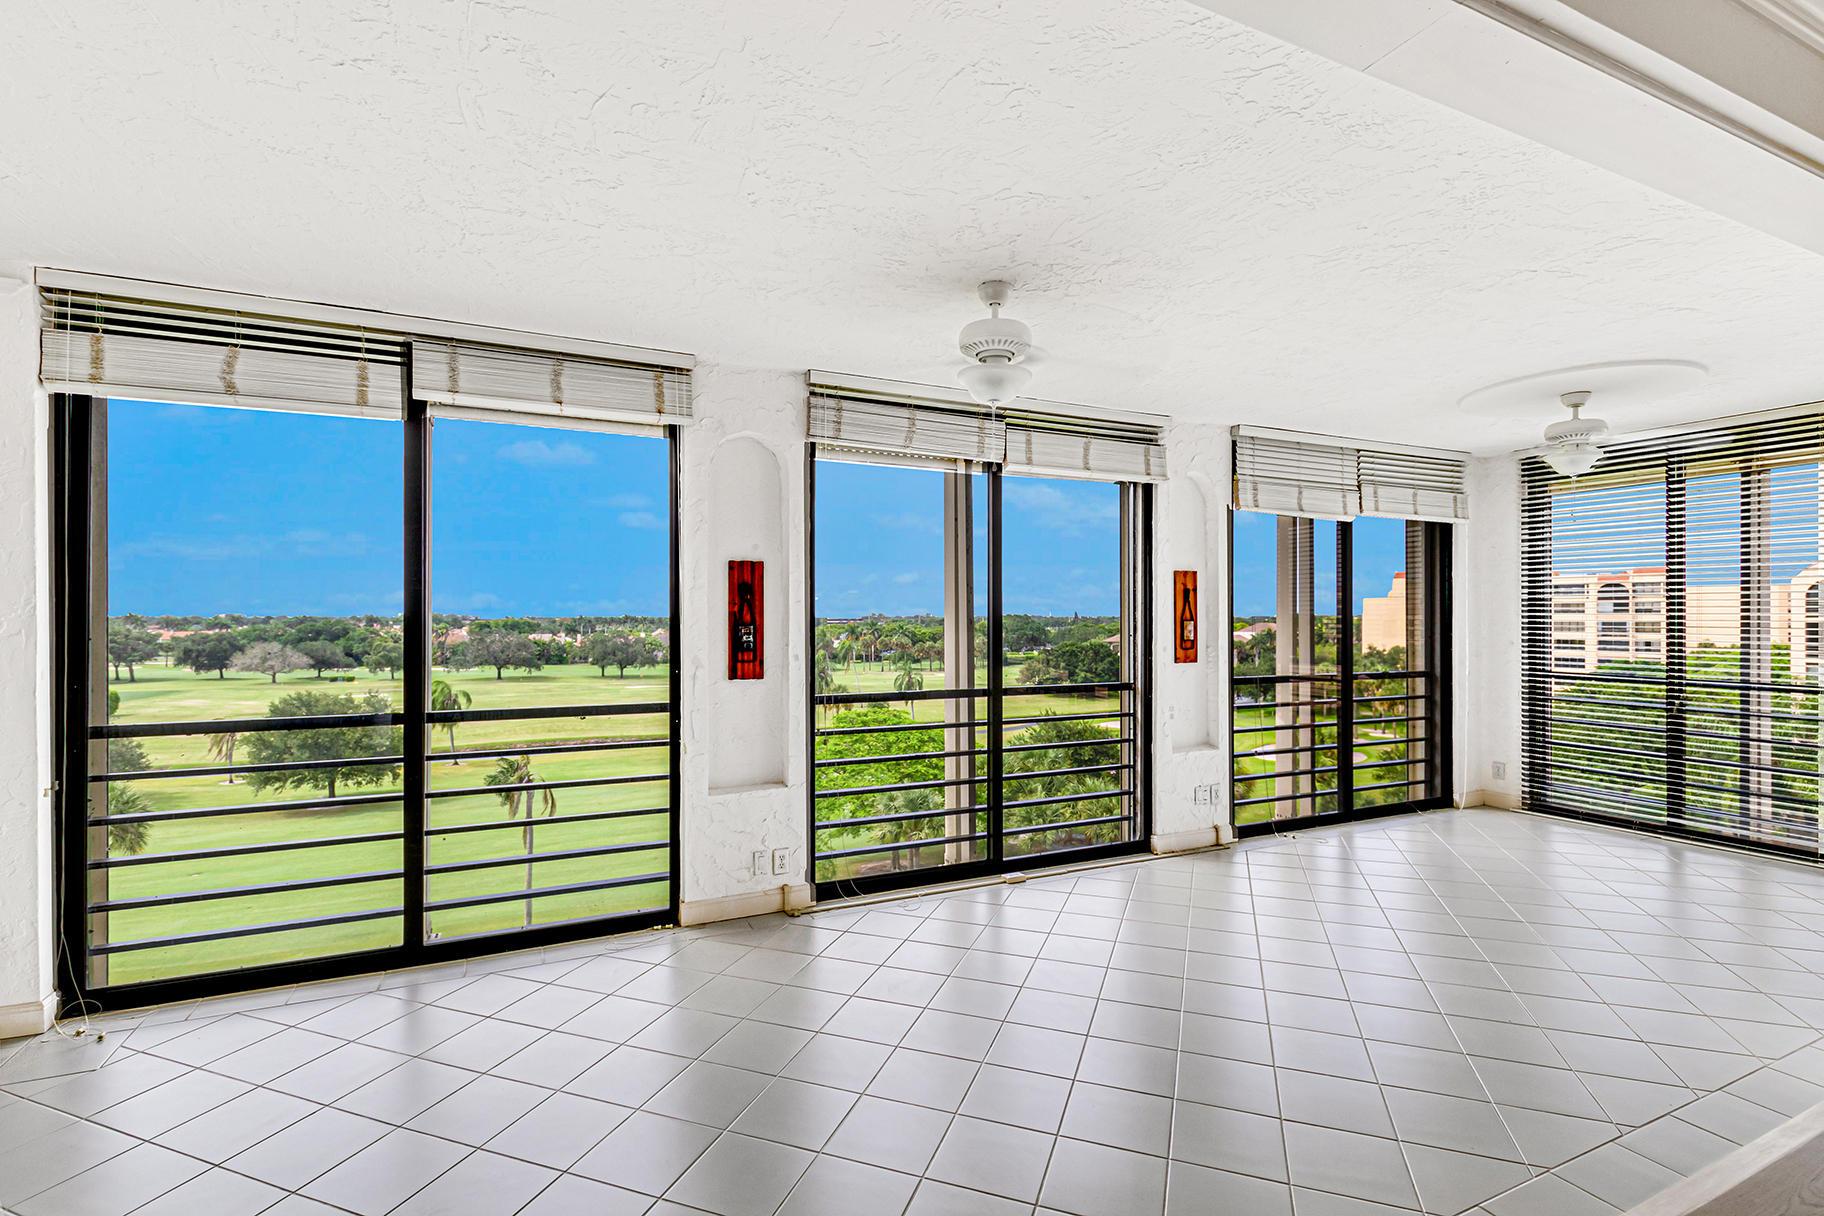 7235 Promenade Drive #k-601 Boca Raton, FL 33433